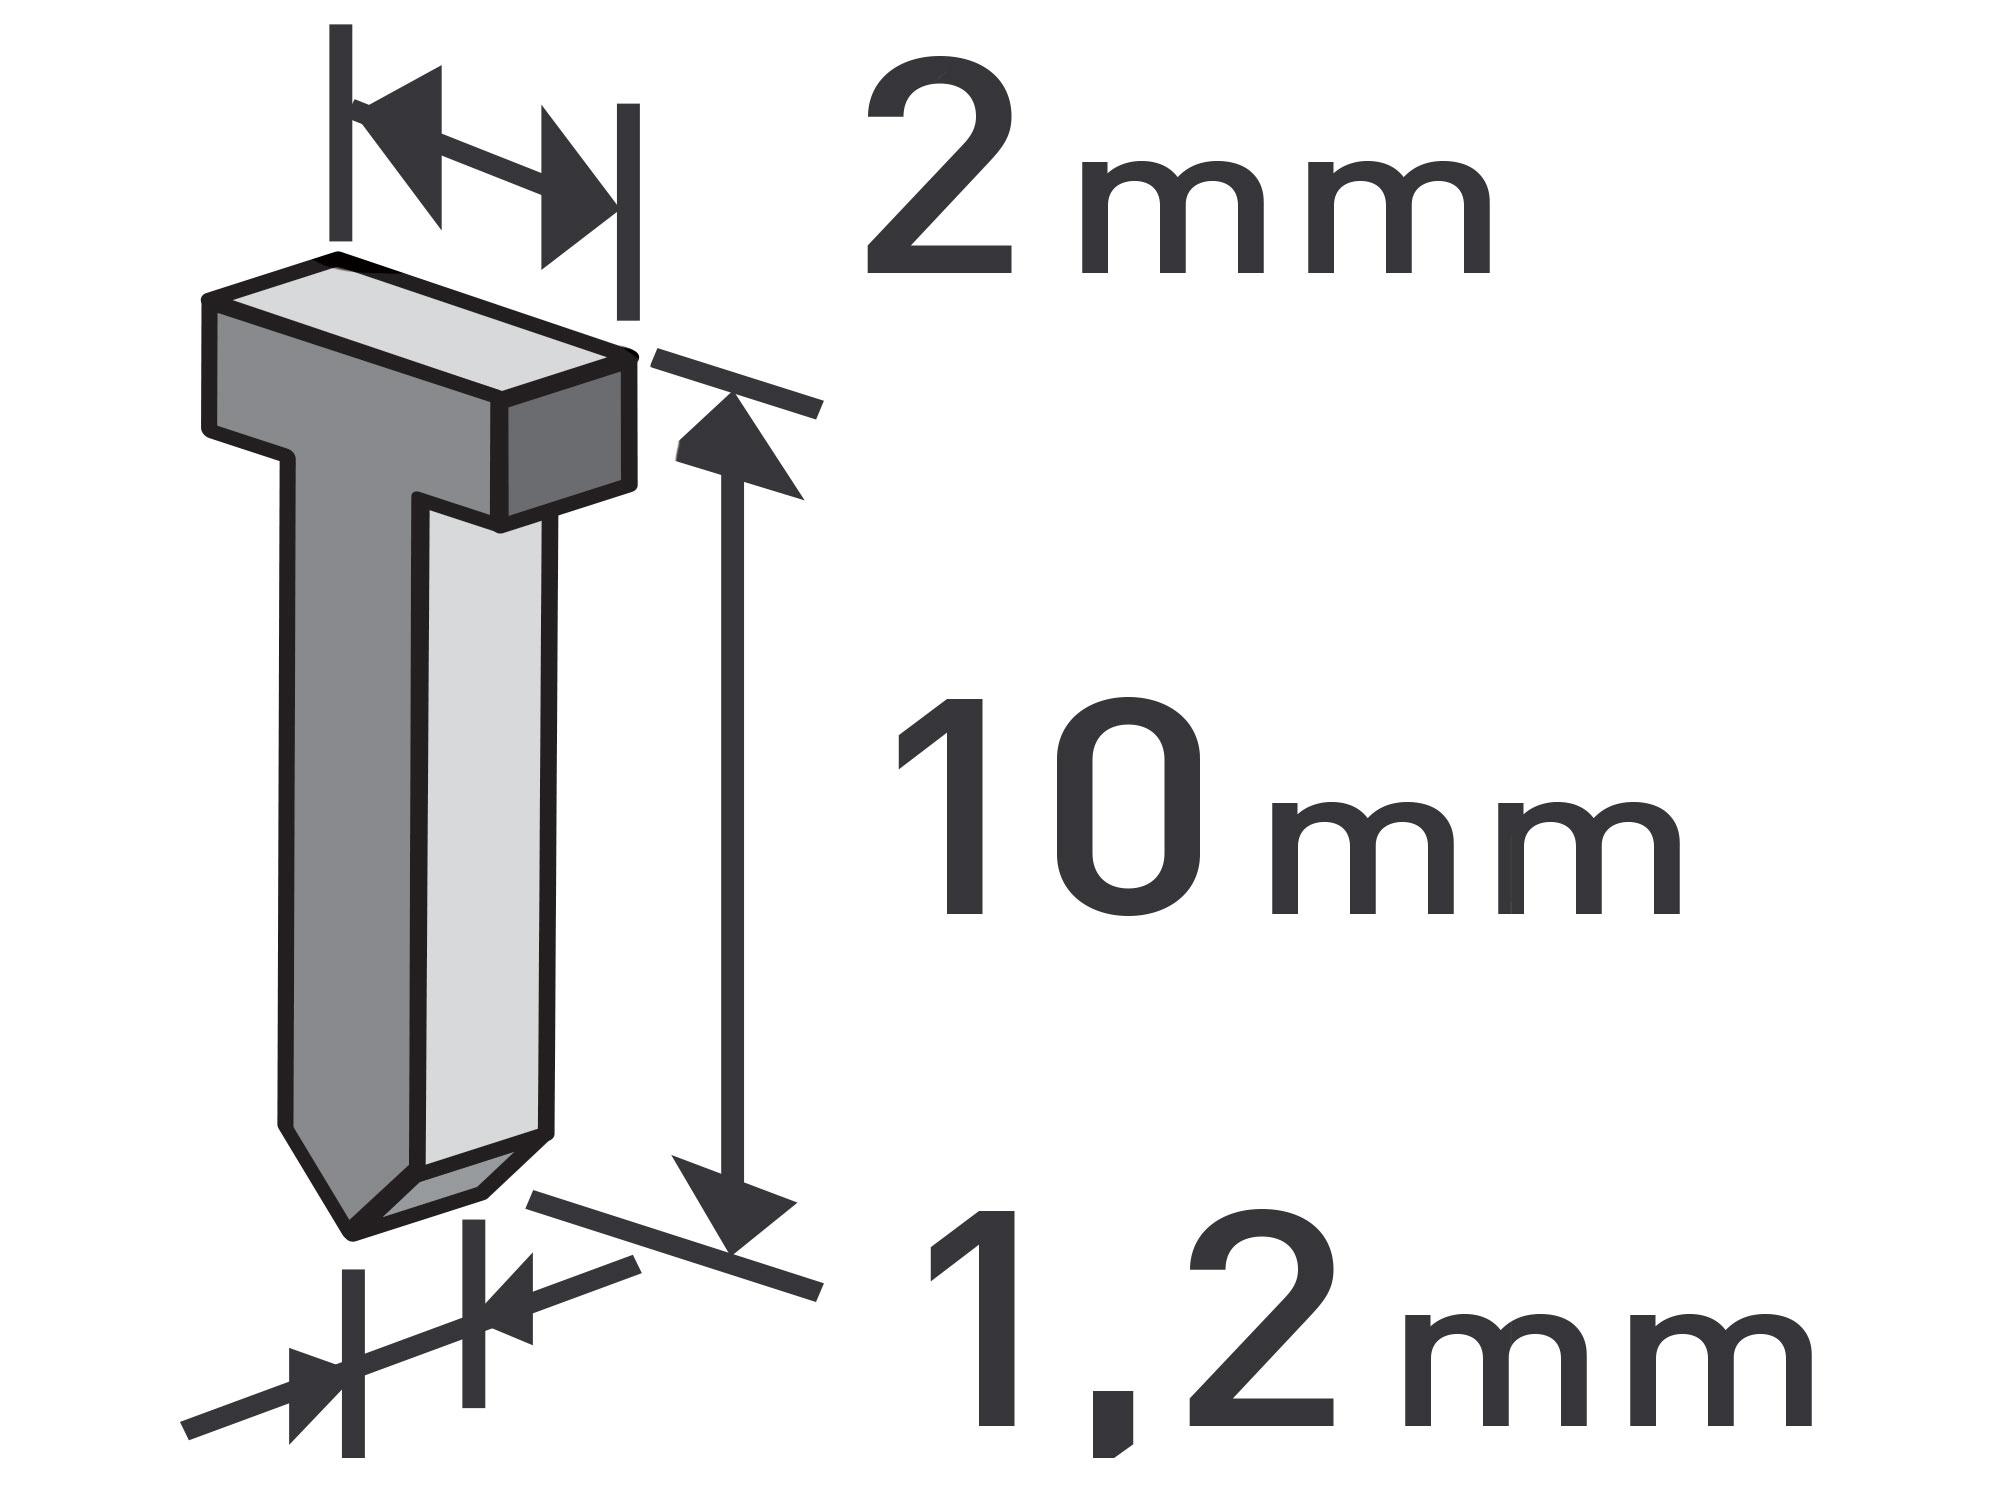 hřebíky, balení 1000ks, 10mm, 2,0x0,52x1,2mm, EXTOL PREMIUM 8852403